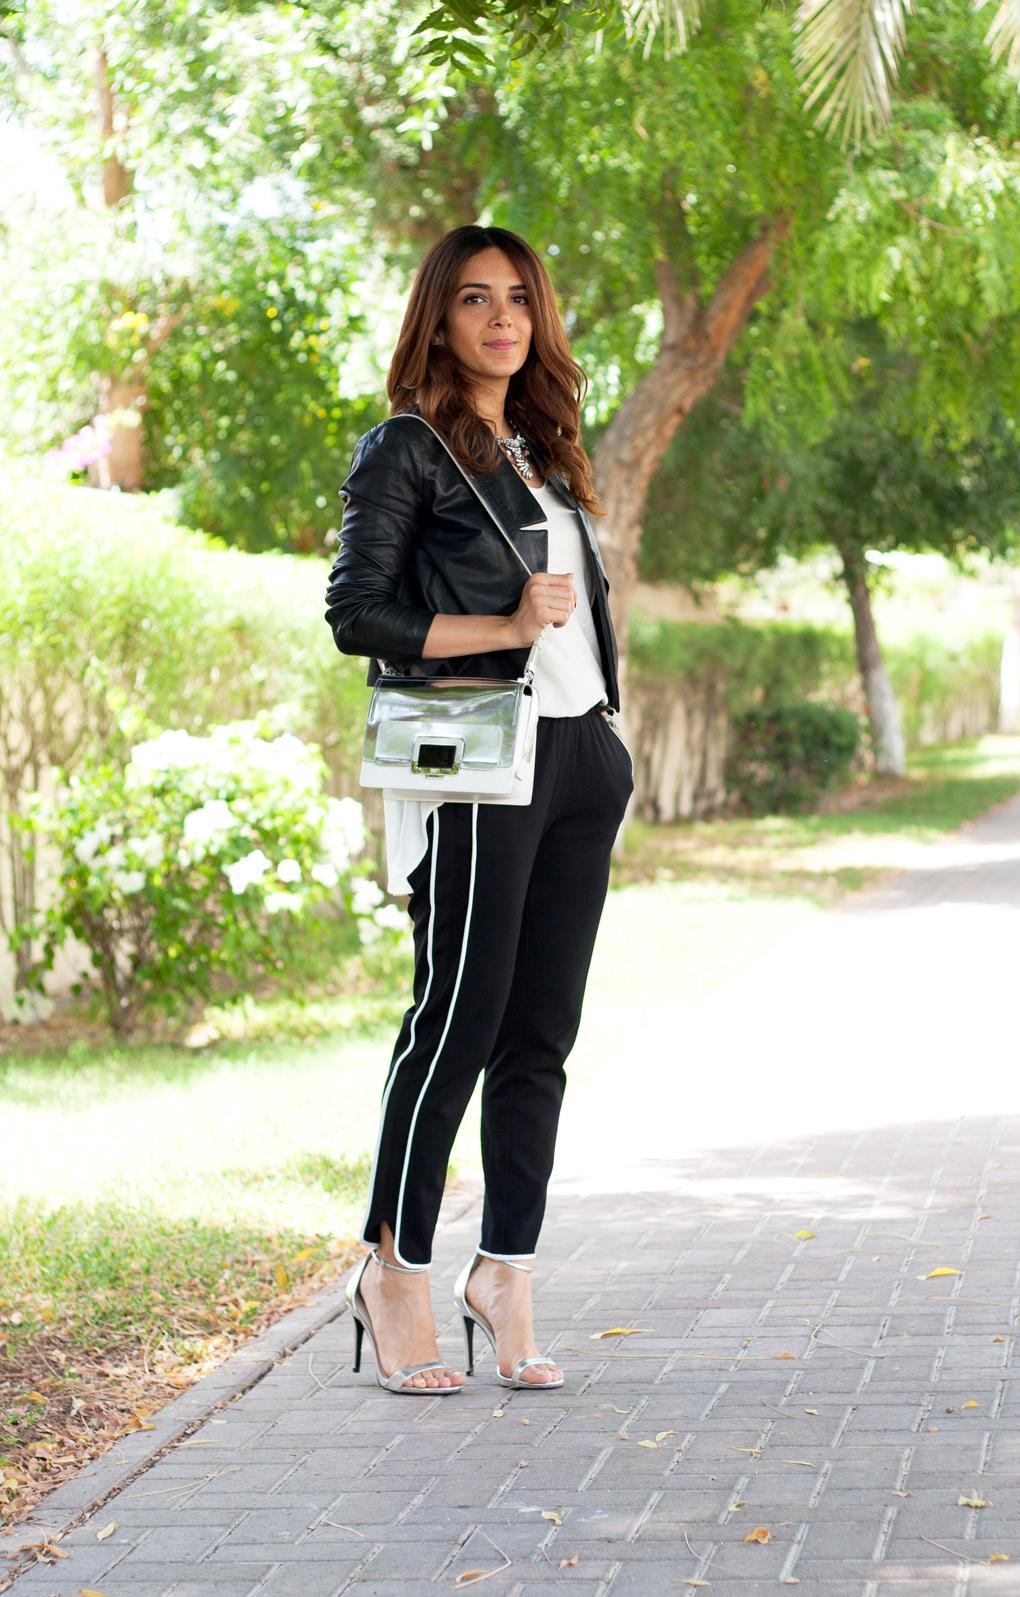 Lyla_Loves_Fashion_Halston_Heritage_Roger_Vivier_9198